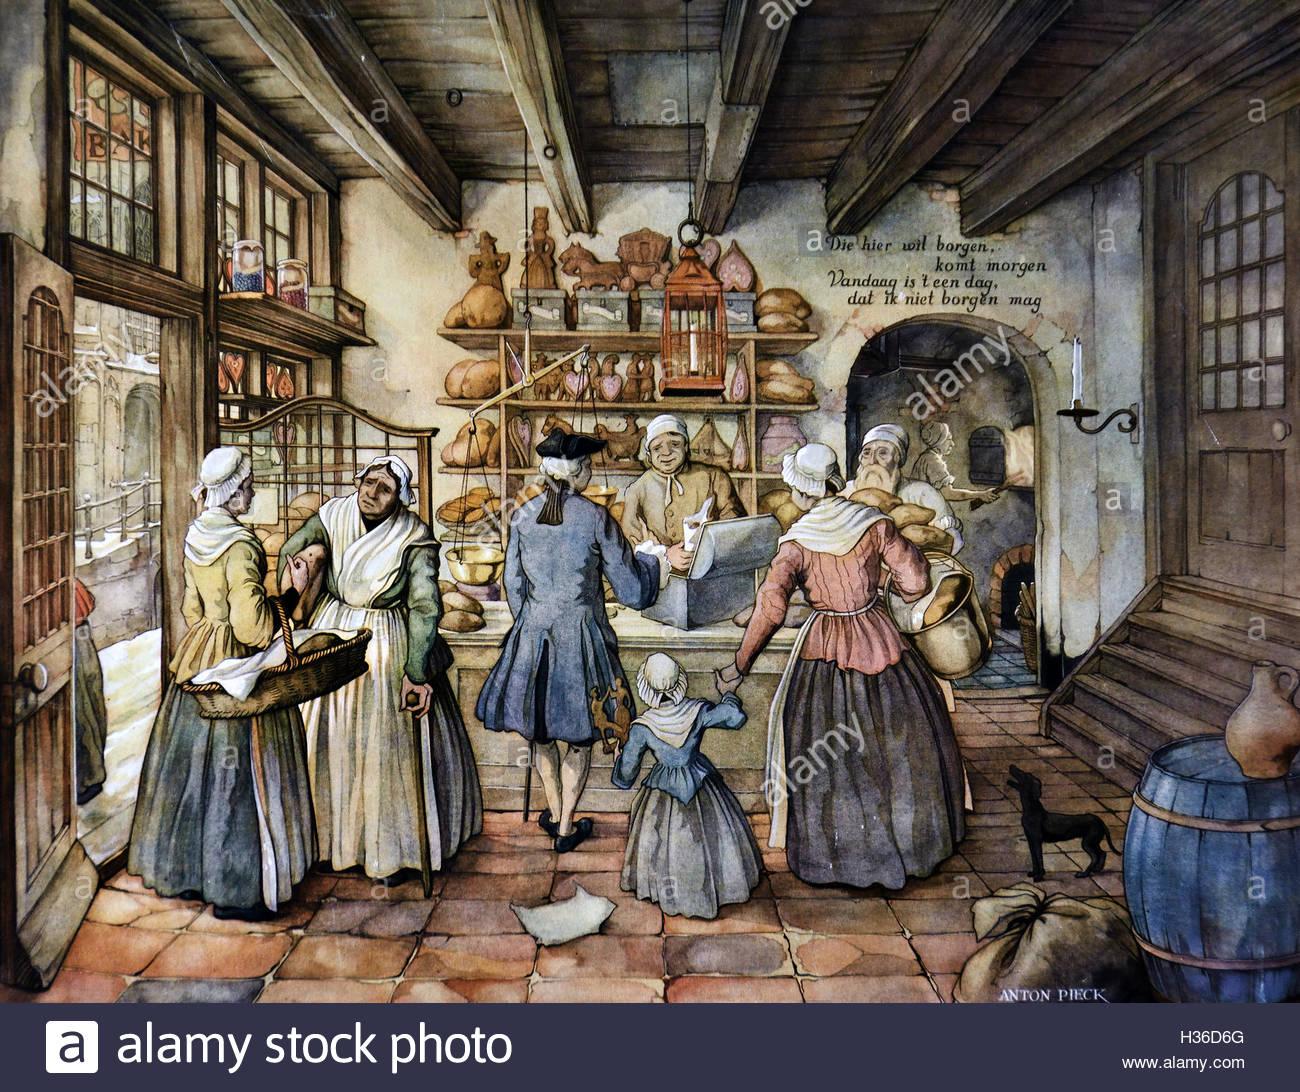 Anton Pieck pittura pane - Panificio Baker. I Paesi Bassi ( Anton Franciscus Piec pittore olandese, artista e artista Immagini Stock